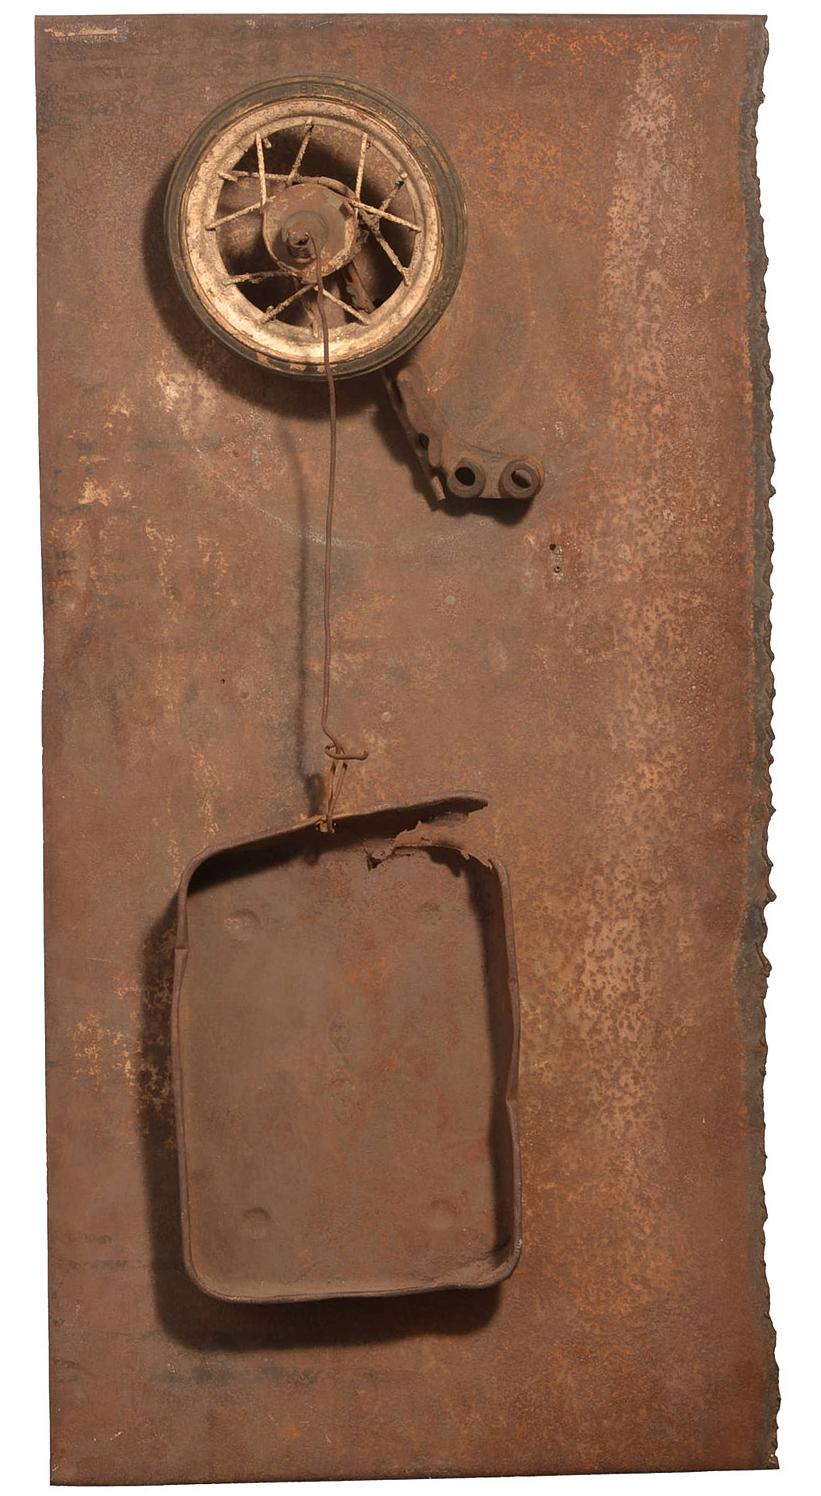 "Jean Tinguely, ""Ma Prima"". 1961, sheet metal, metal pan, wheel, electrical motor."